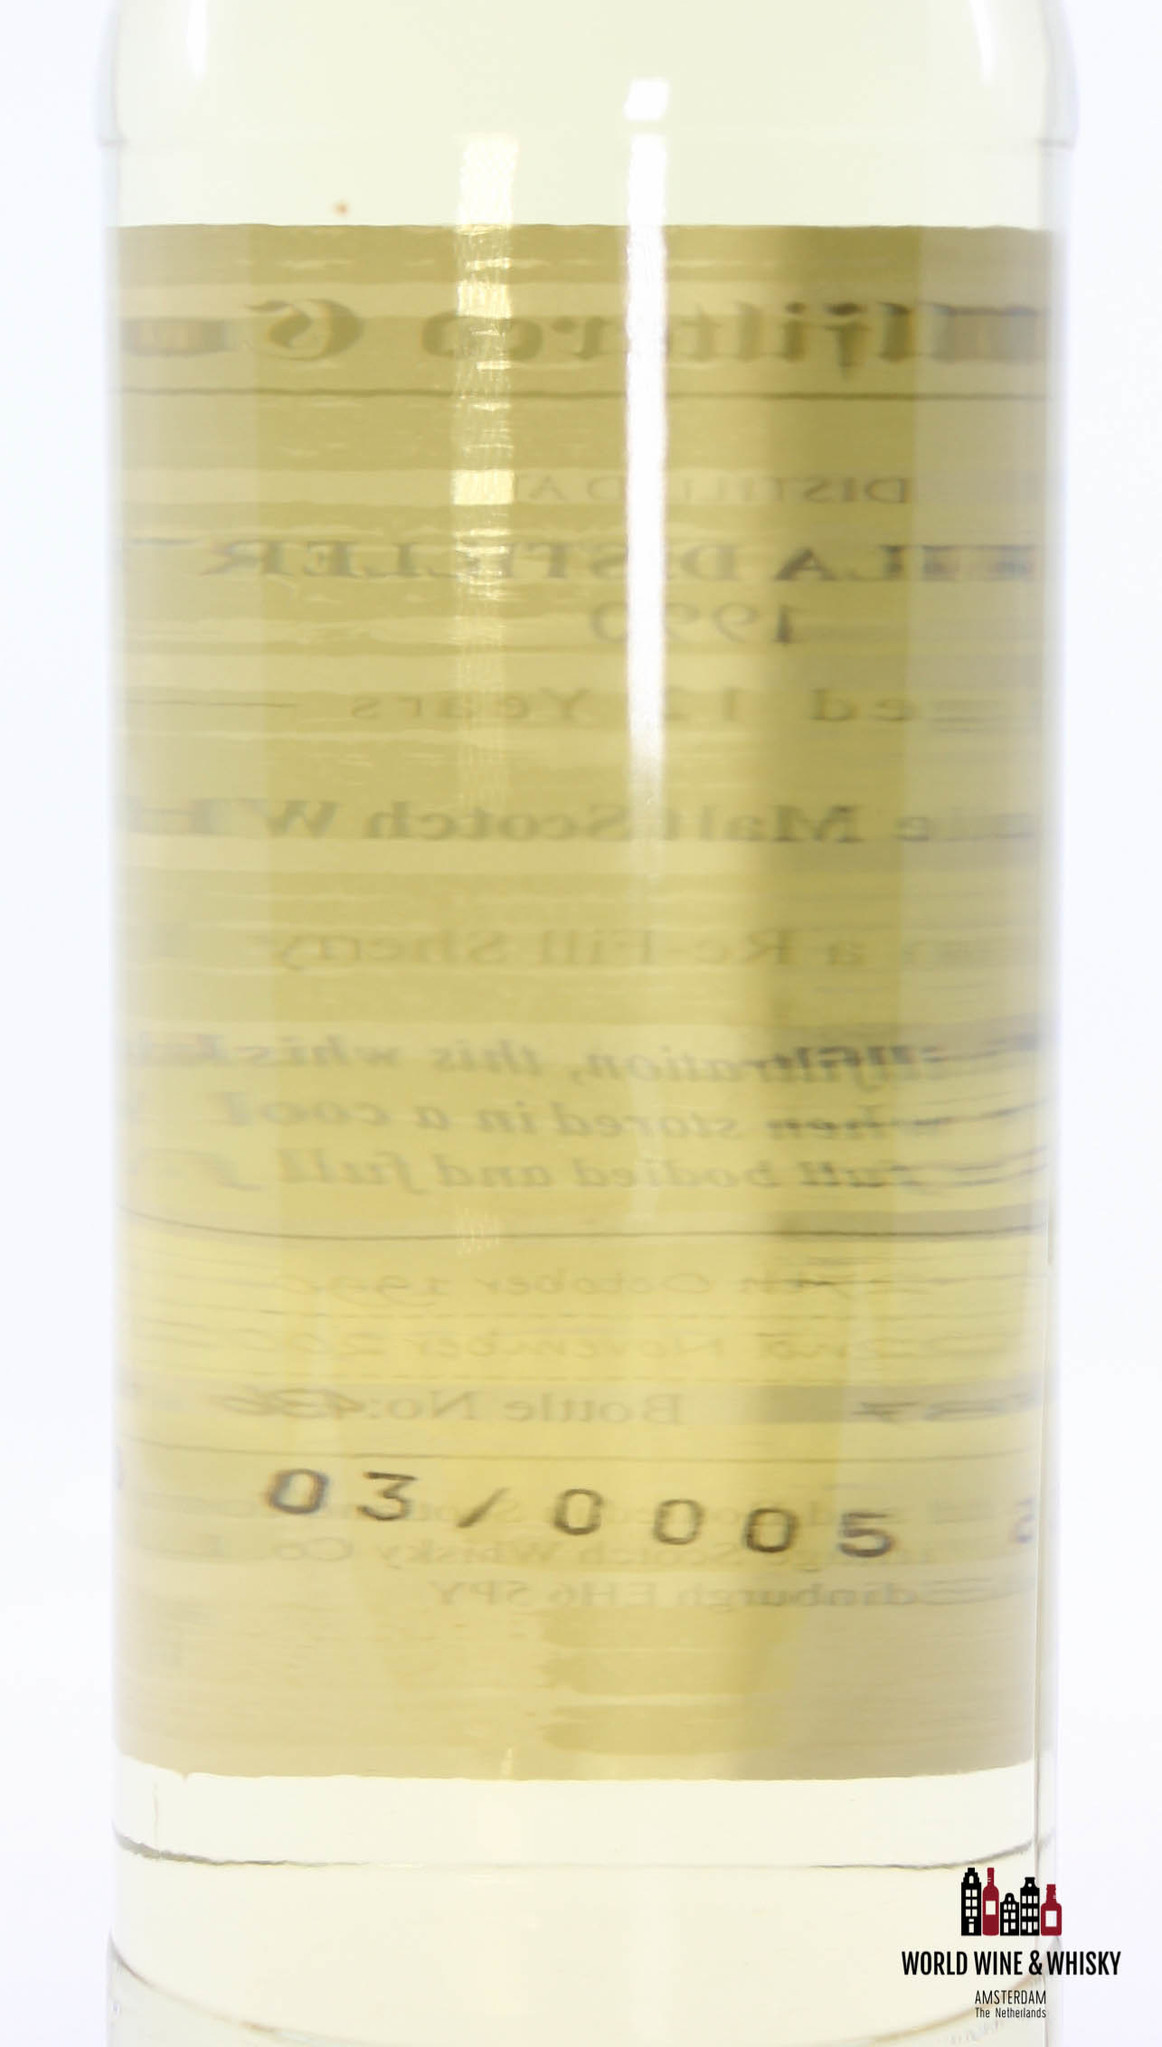 Caol Ila Caol Ila 12 Years Old 1990 2002 Signatory Vintage - Cask 13937 46% (one of 851 bottles)